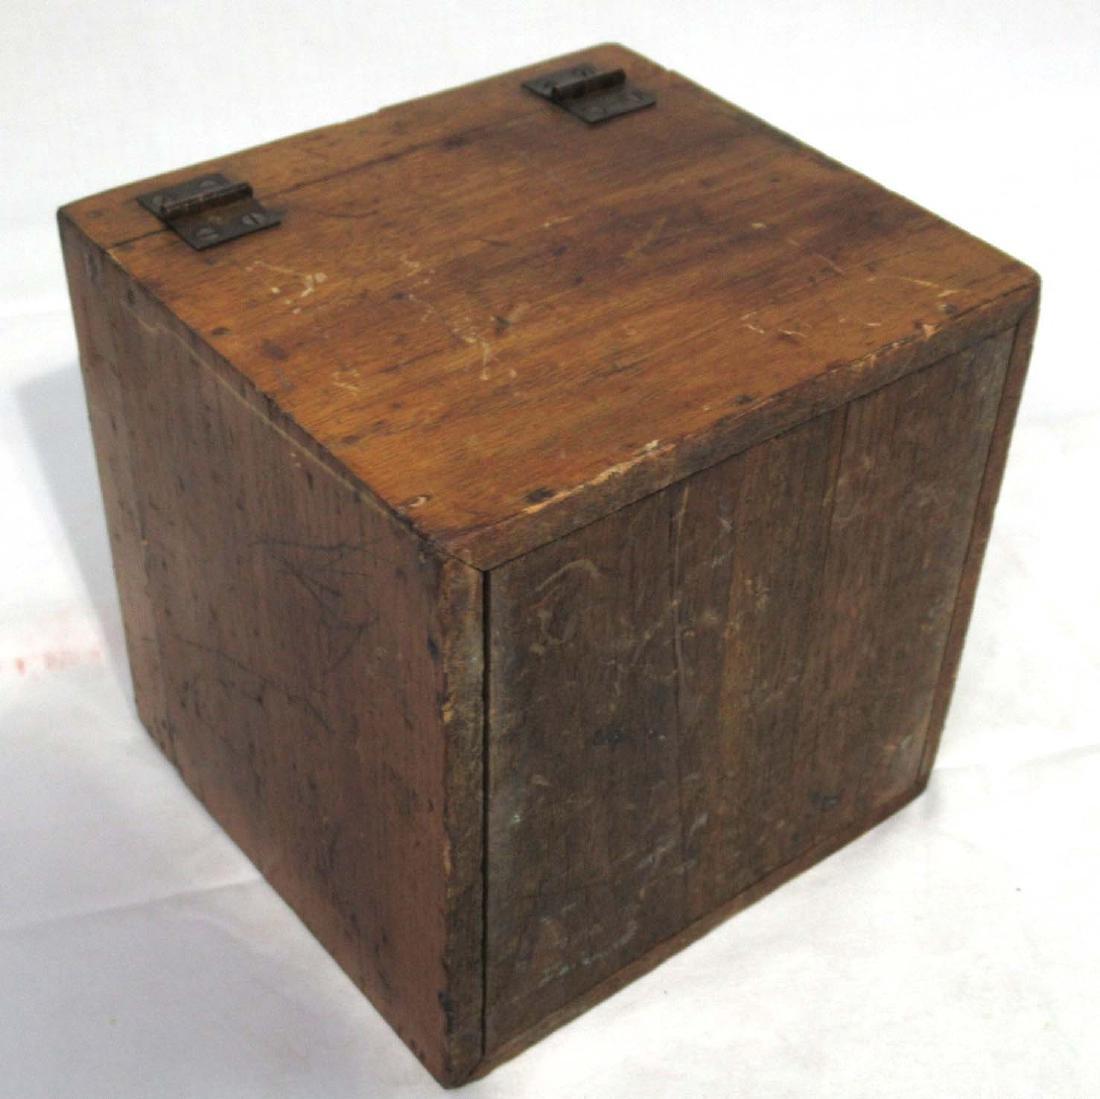 Wooden Cube Root Blocks in Orig. Box - 4